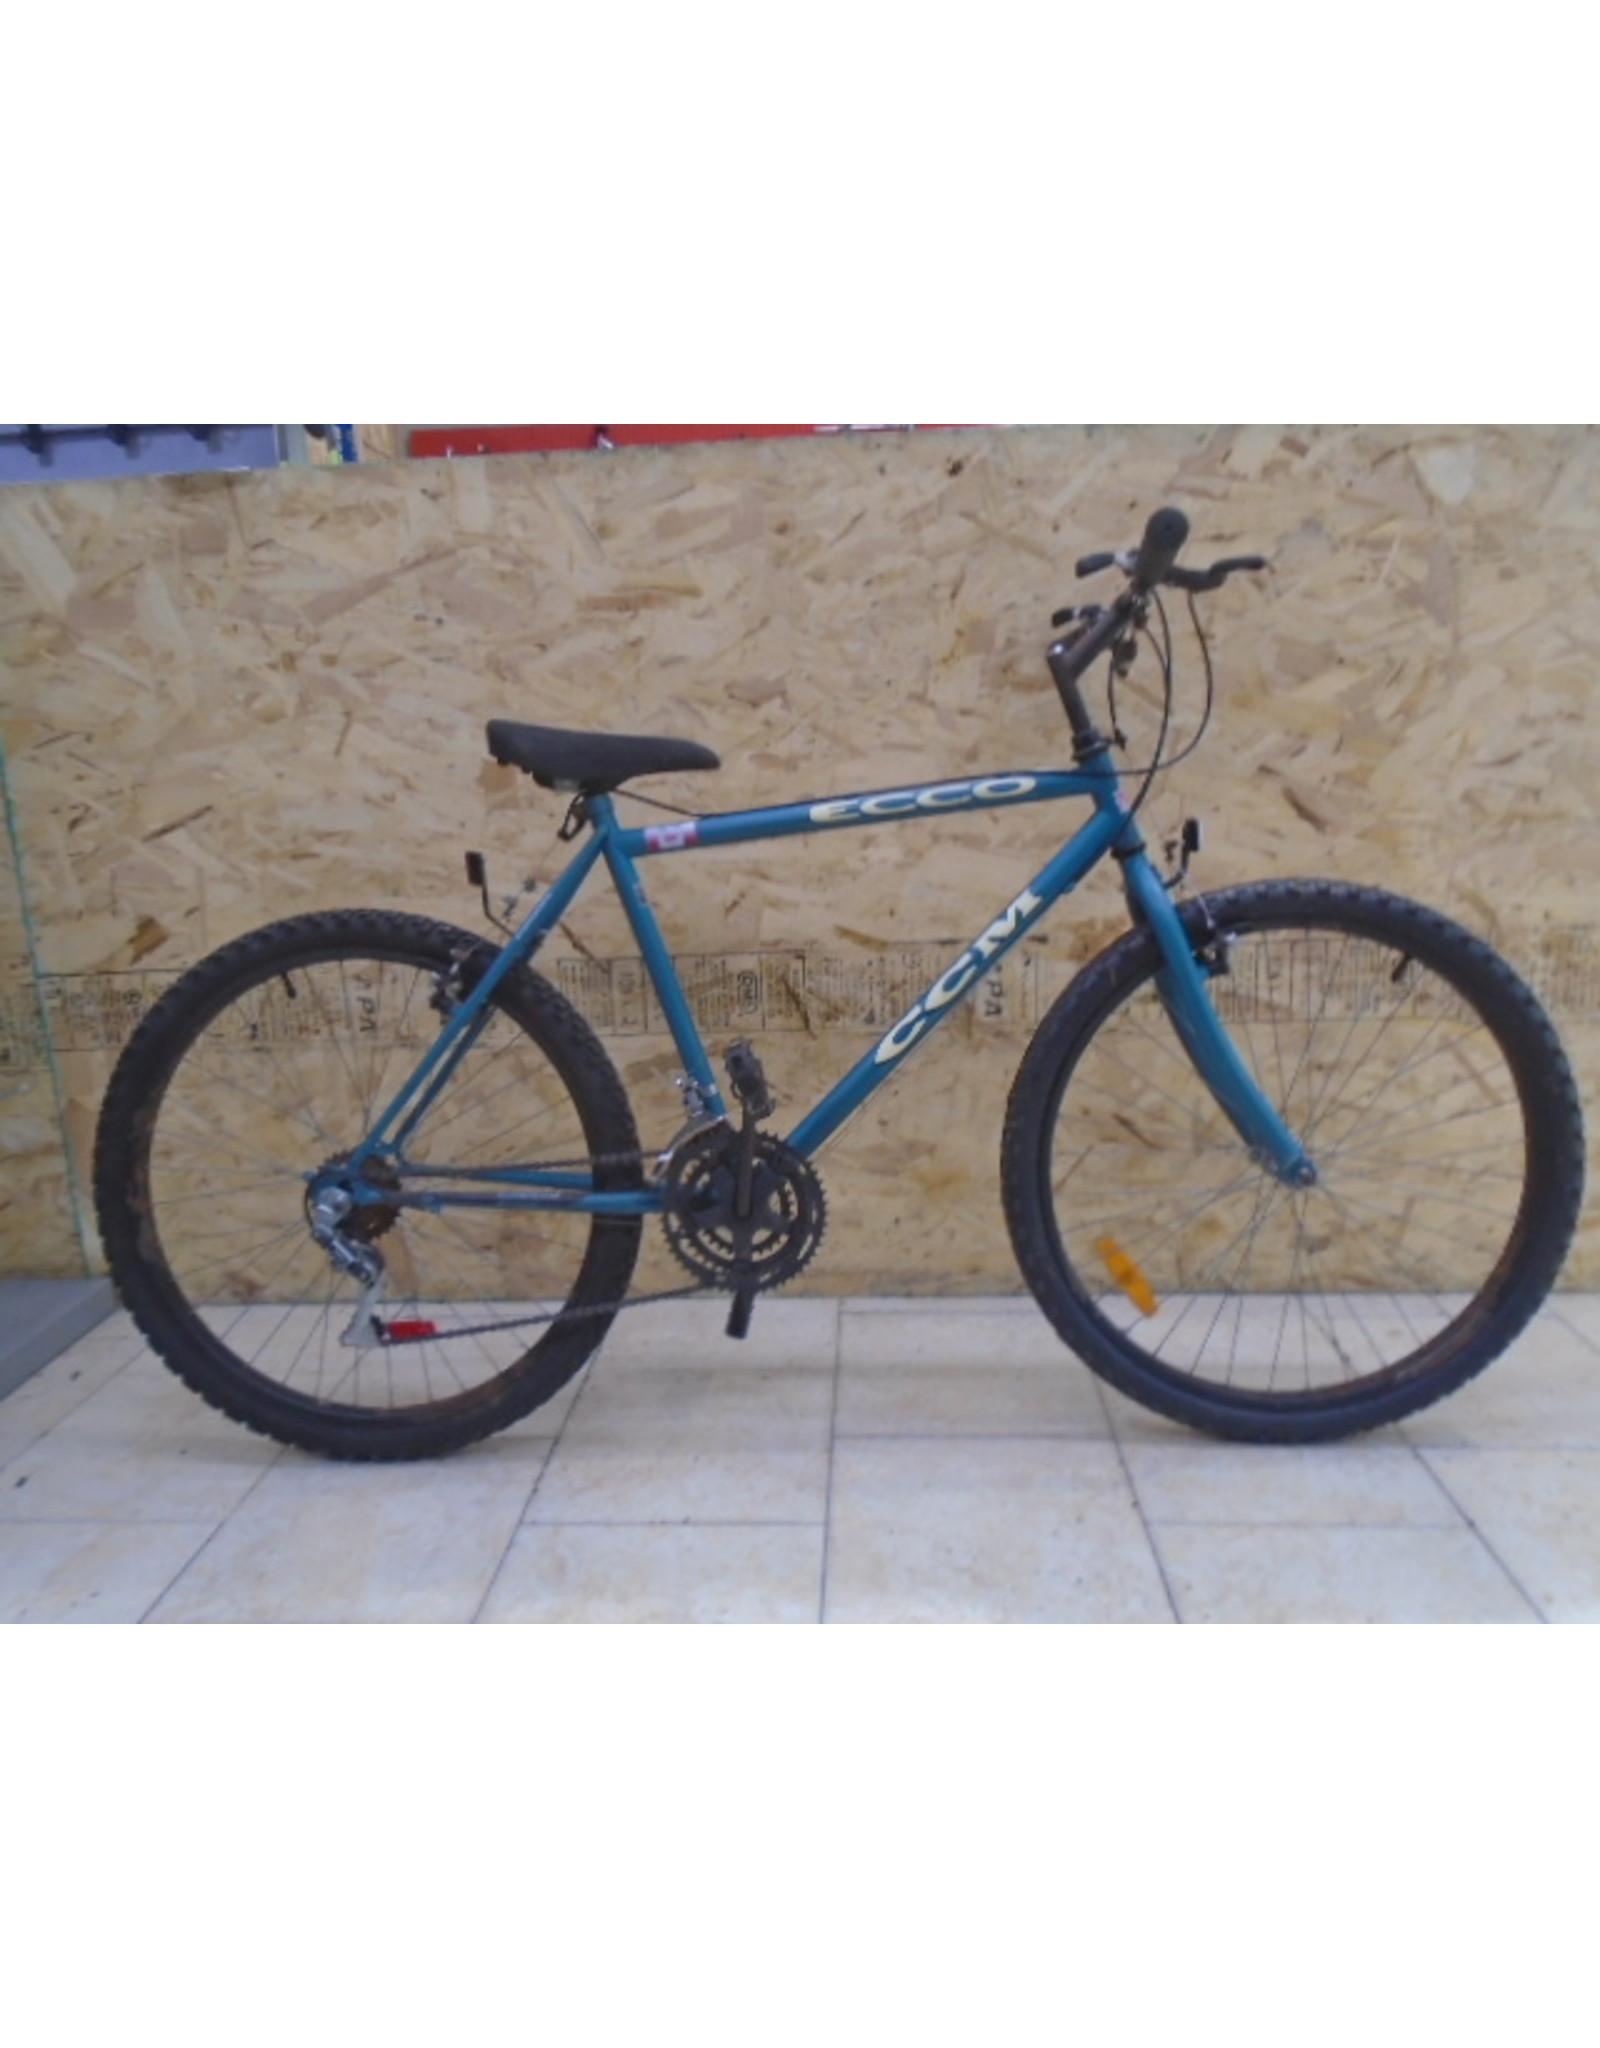 "Vélo usagé de montagne CCM 19"" - 9759"